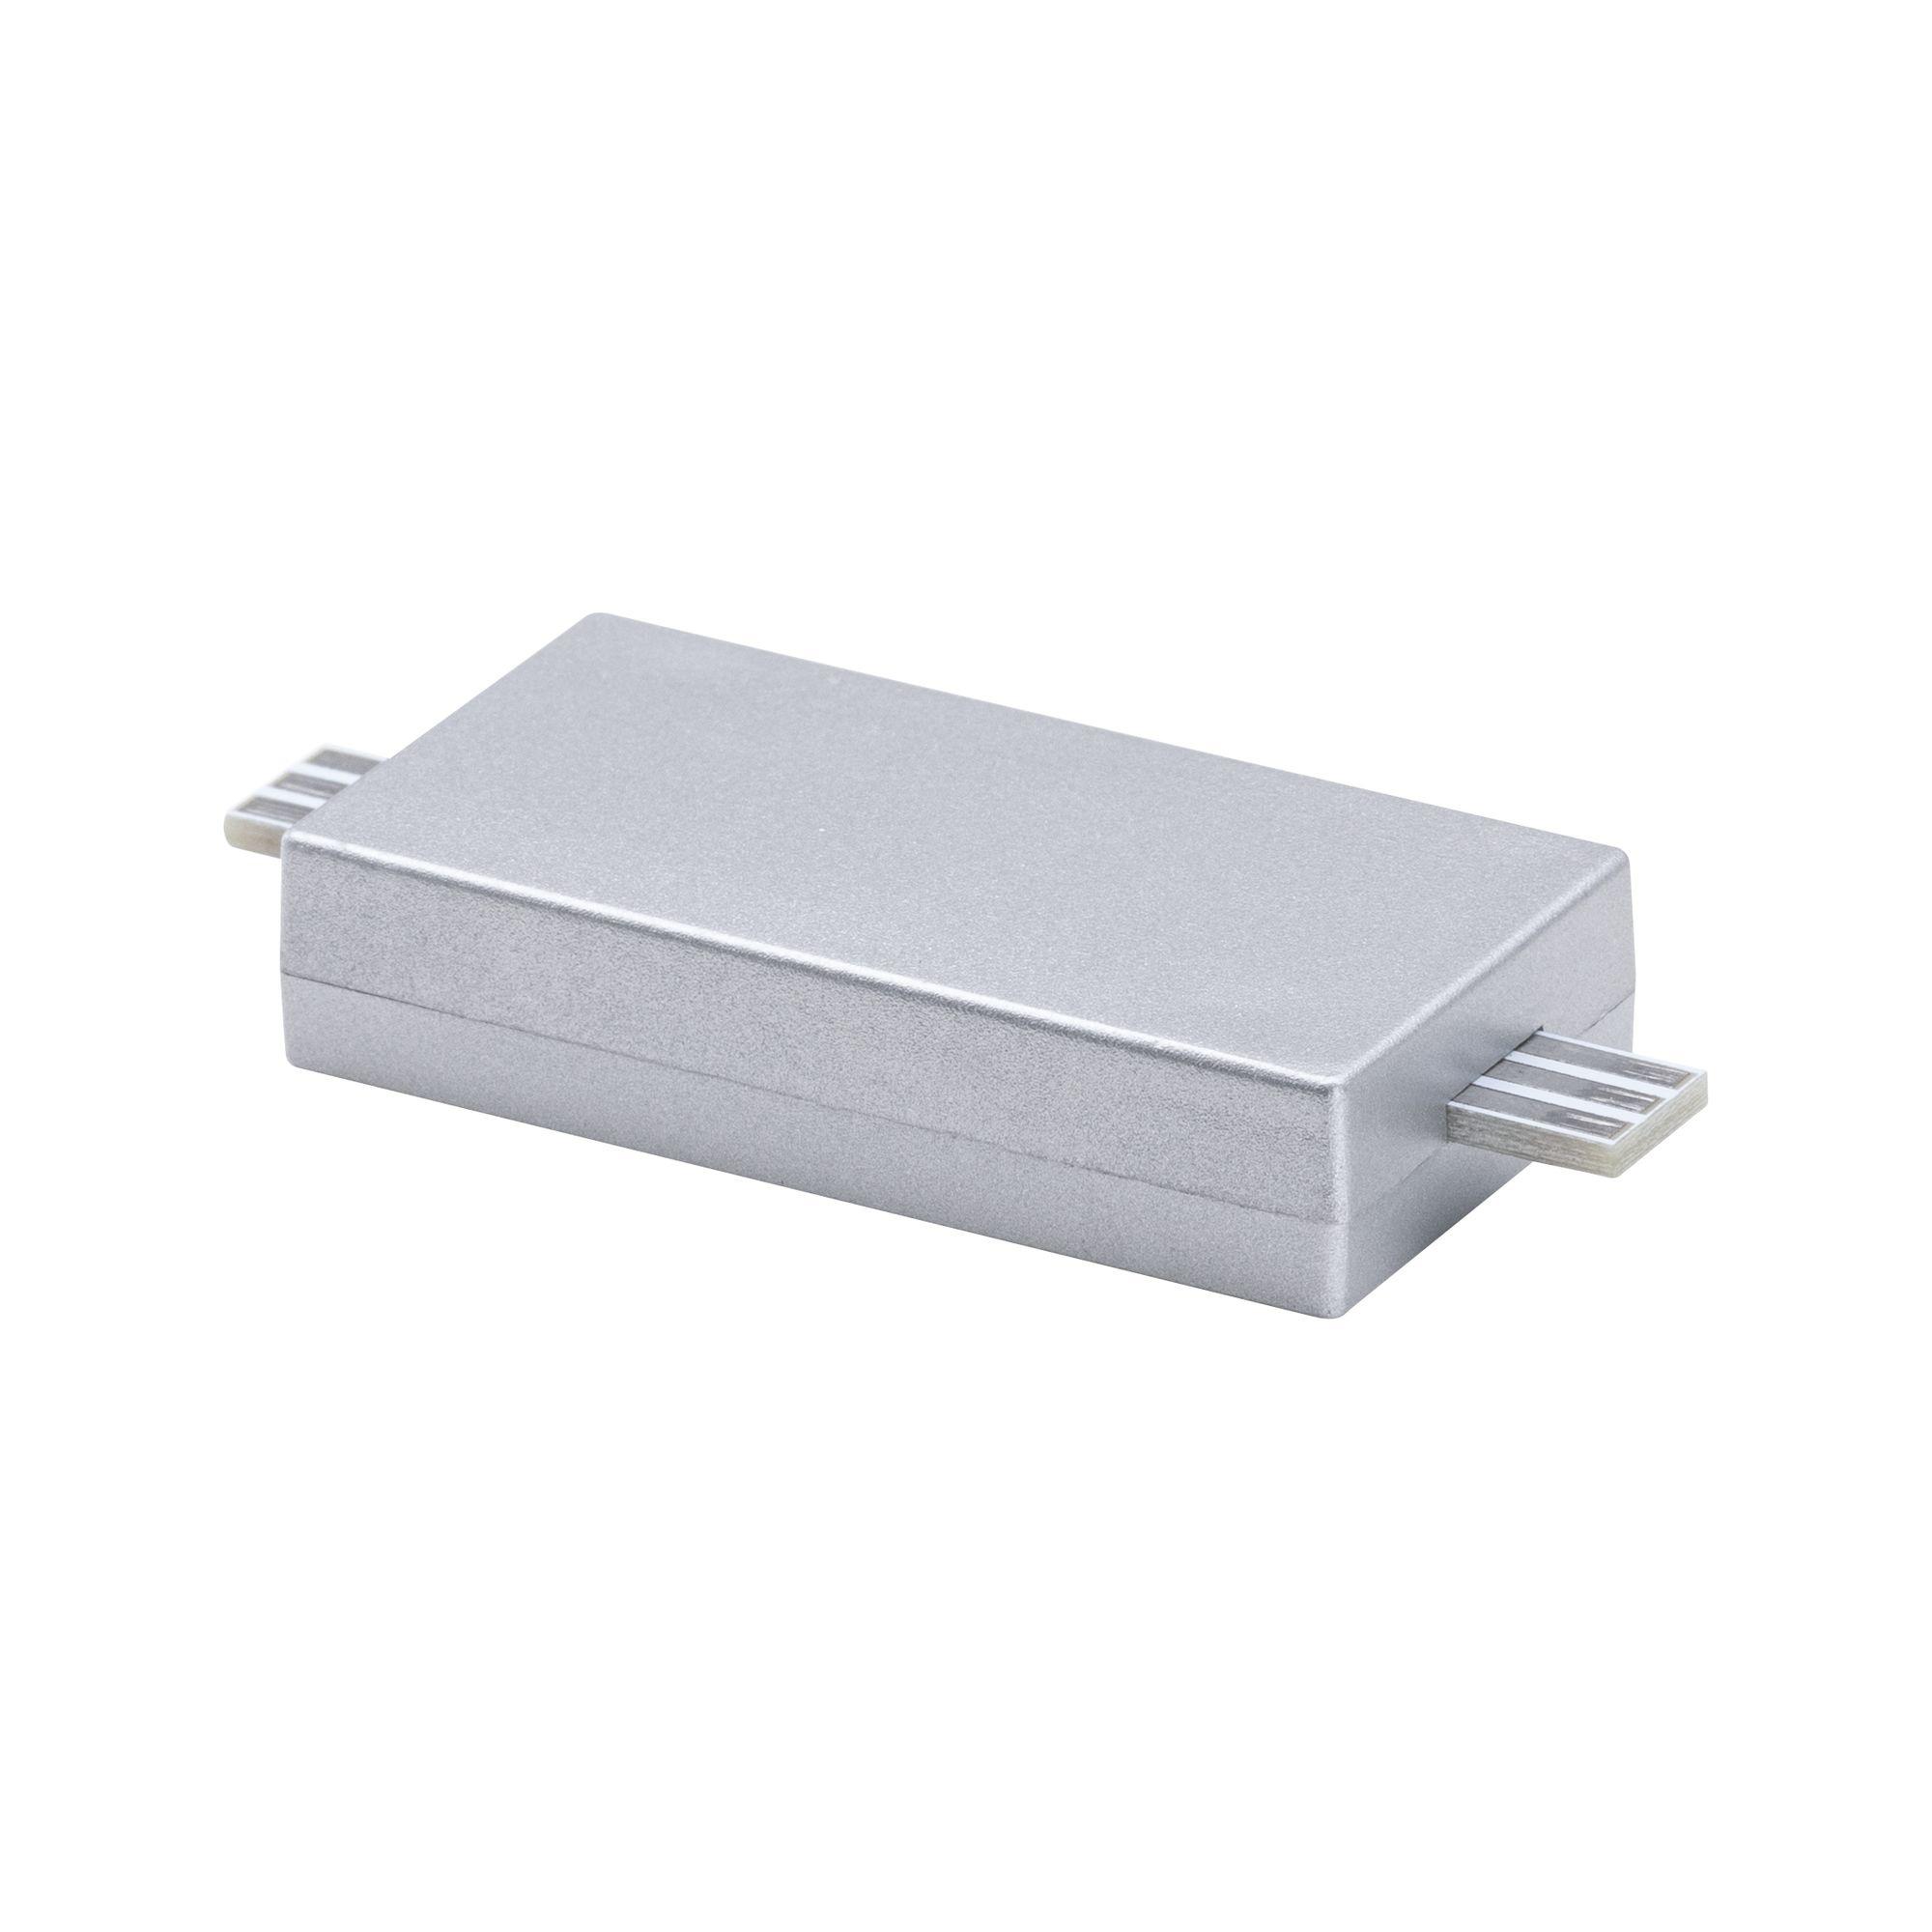 Paulmann Möbelleuchten Clever Connect Linien-Verbinder Barre Chrom matt 12V